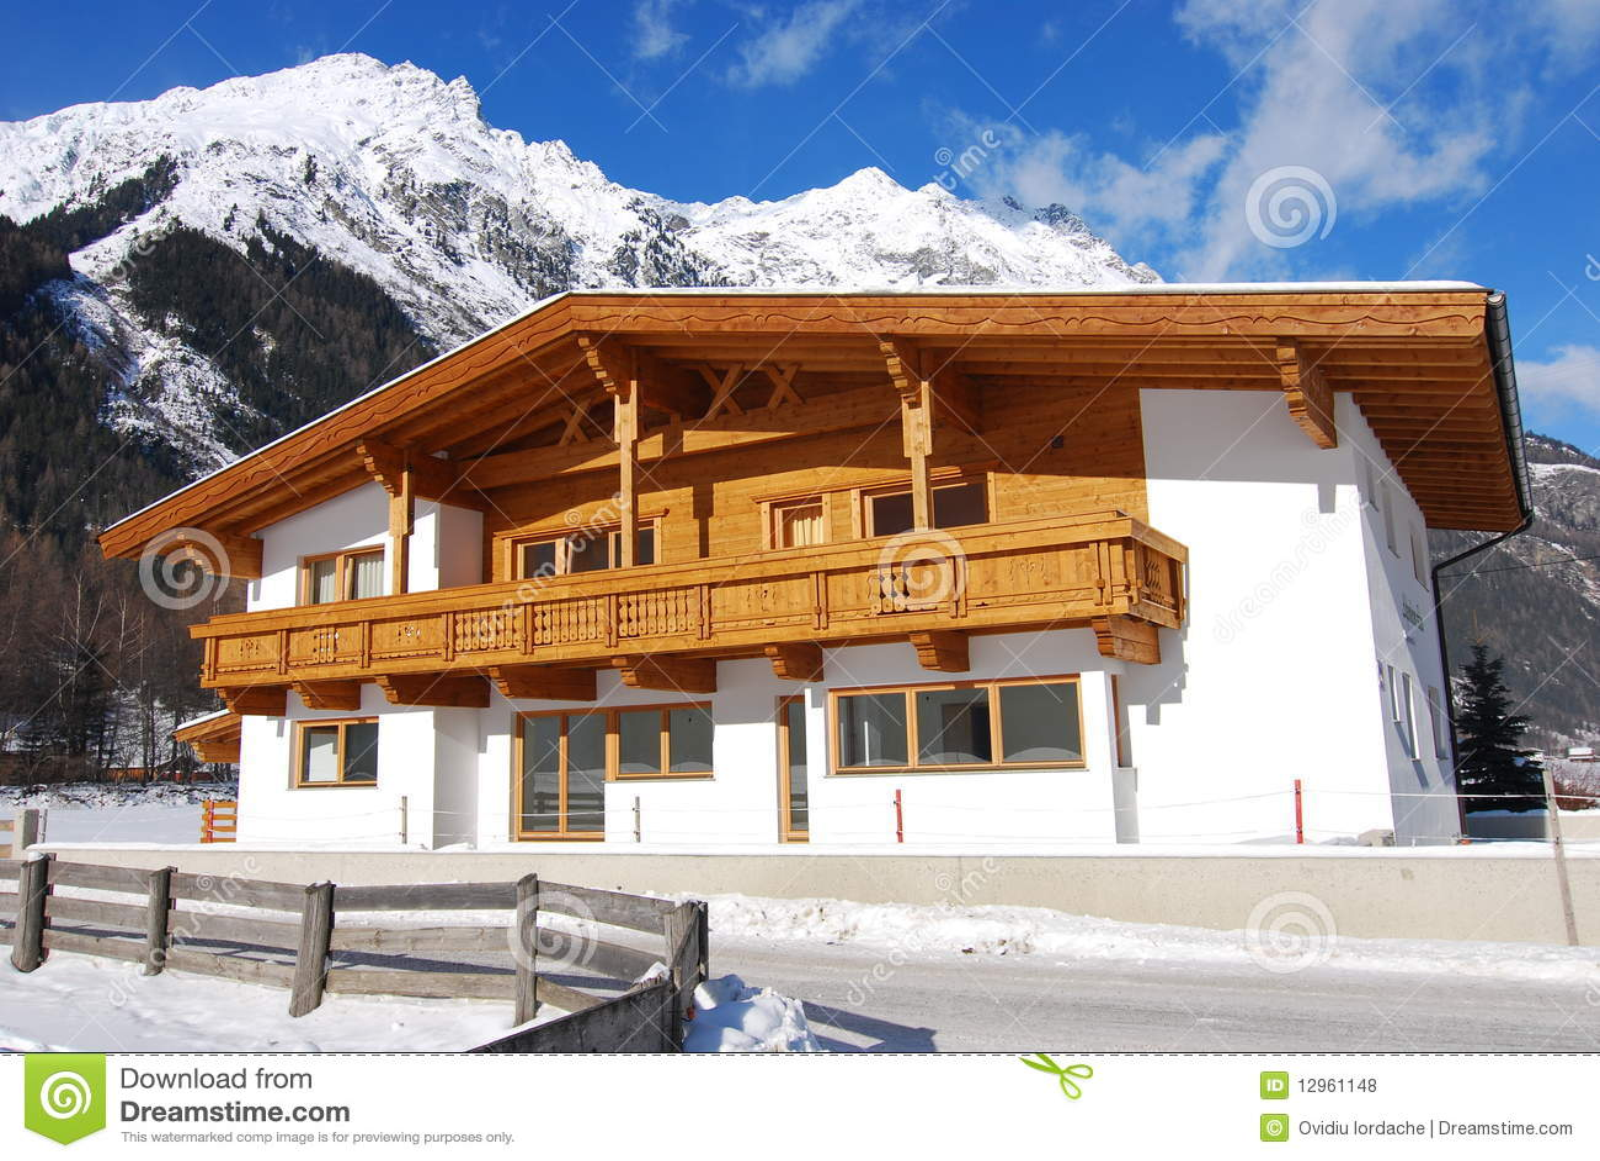 traditional tirol house royalty free stock photos image